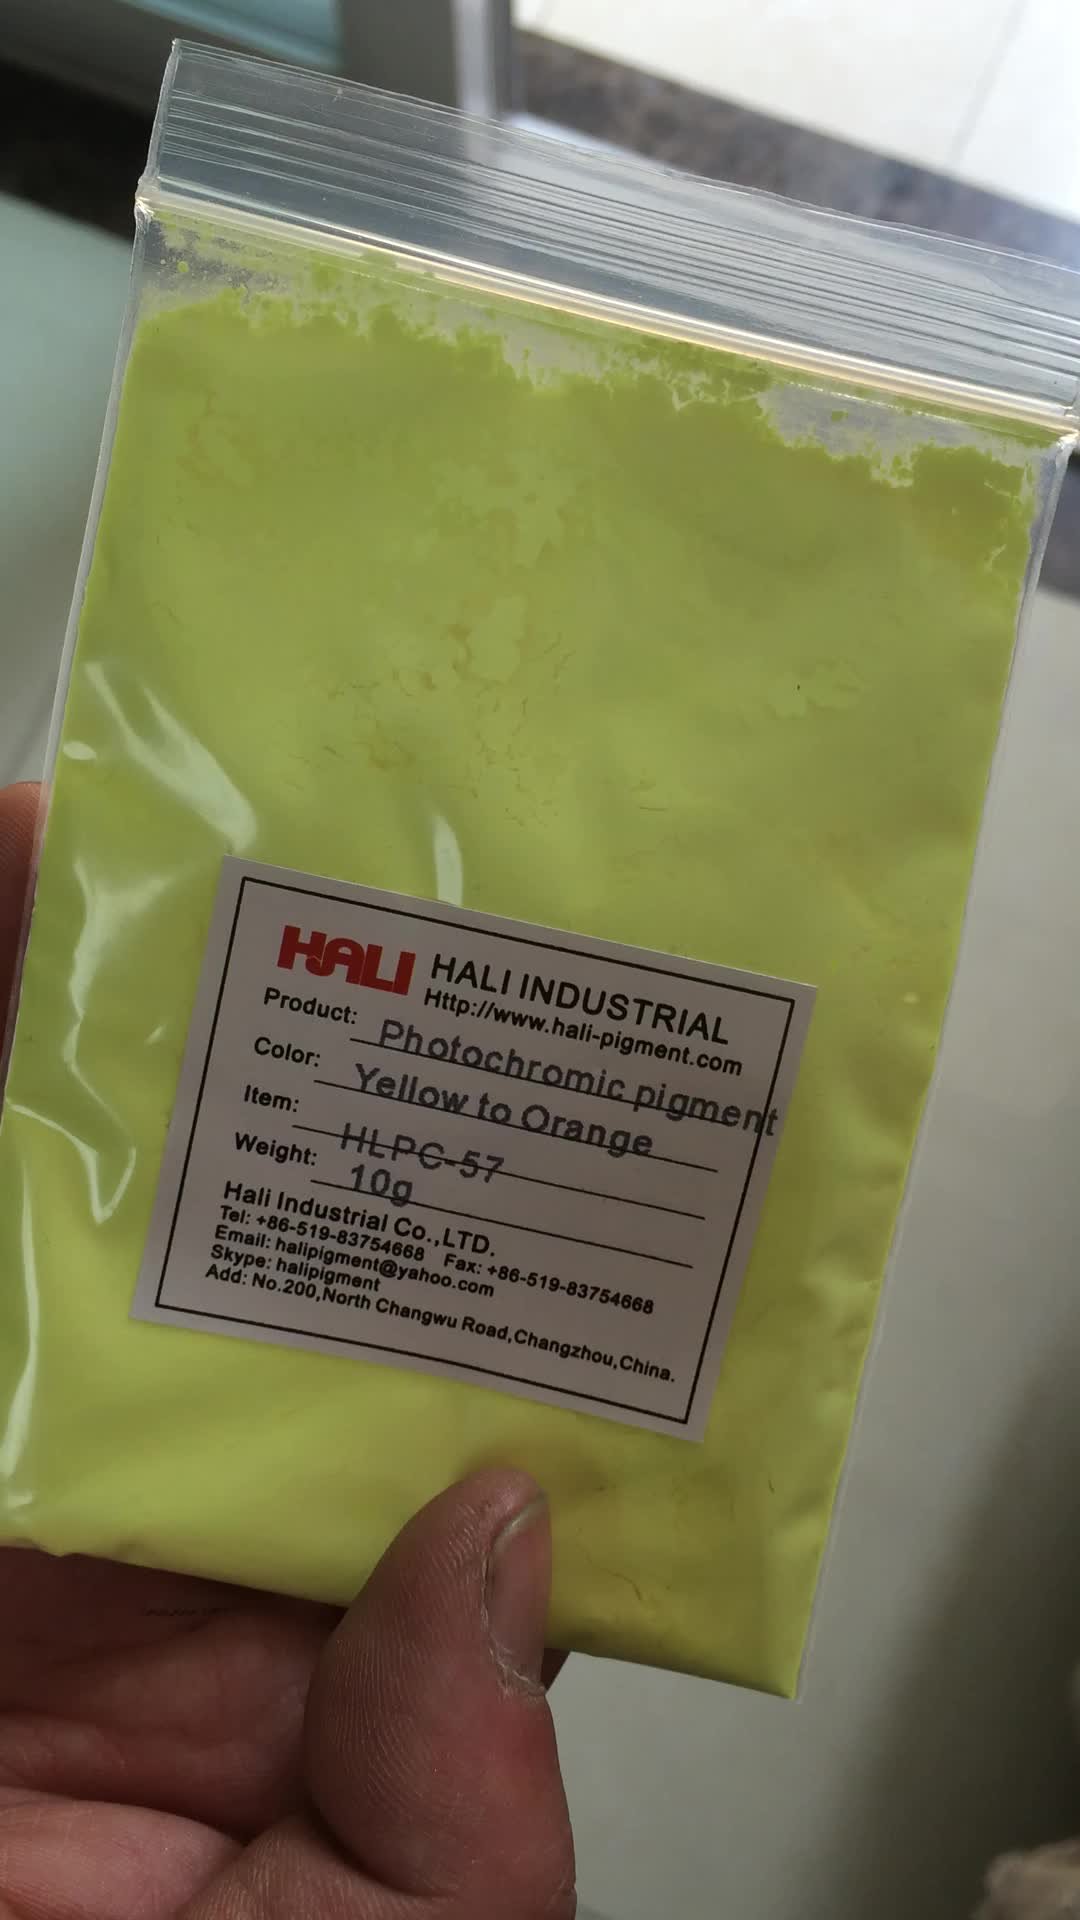 photochromic pigment, UV light active powder, solar sensitive , item:HLPC-57, yellow to orange